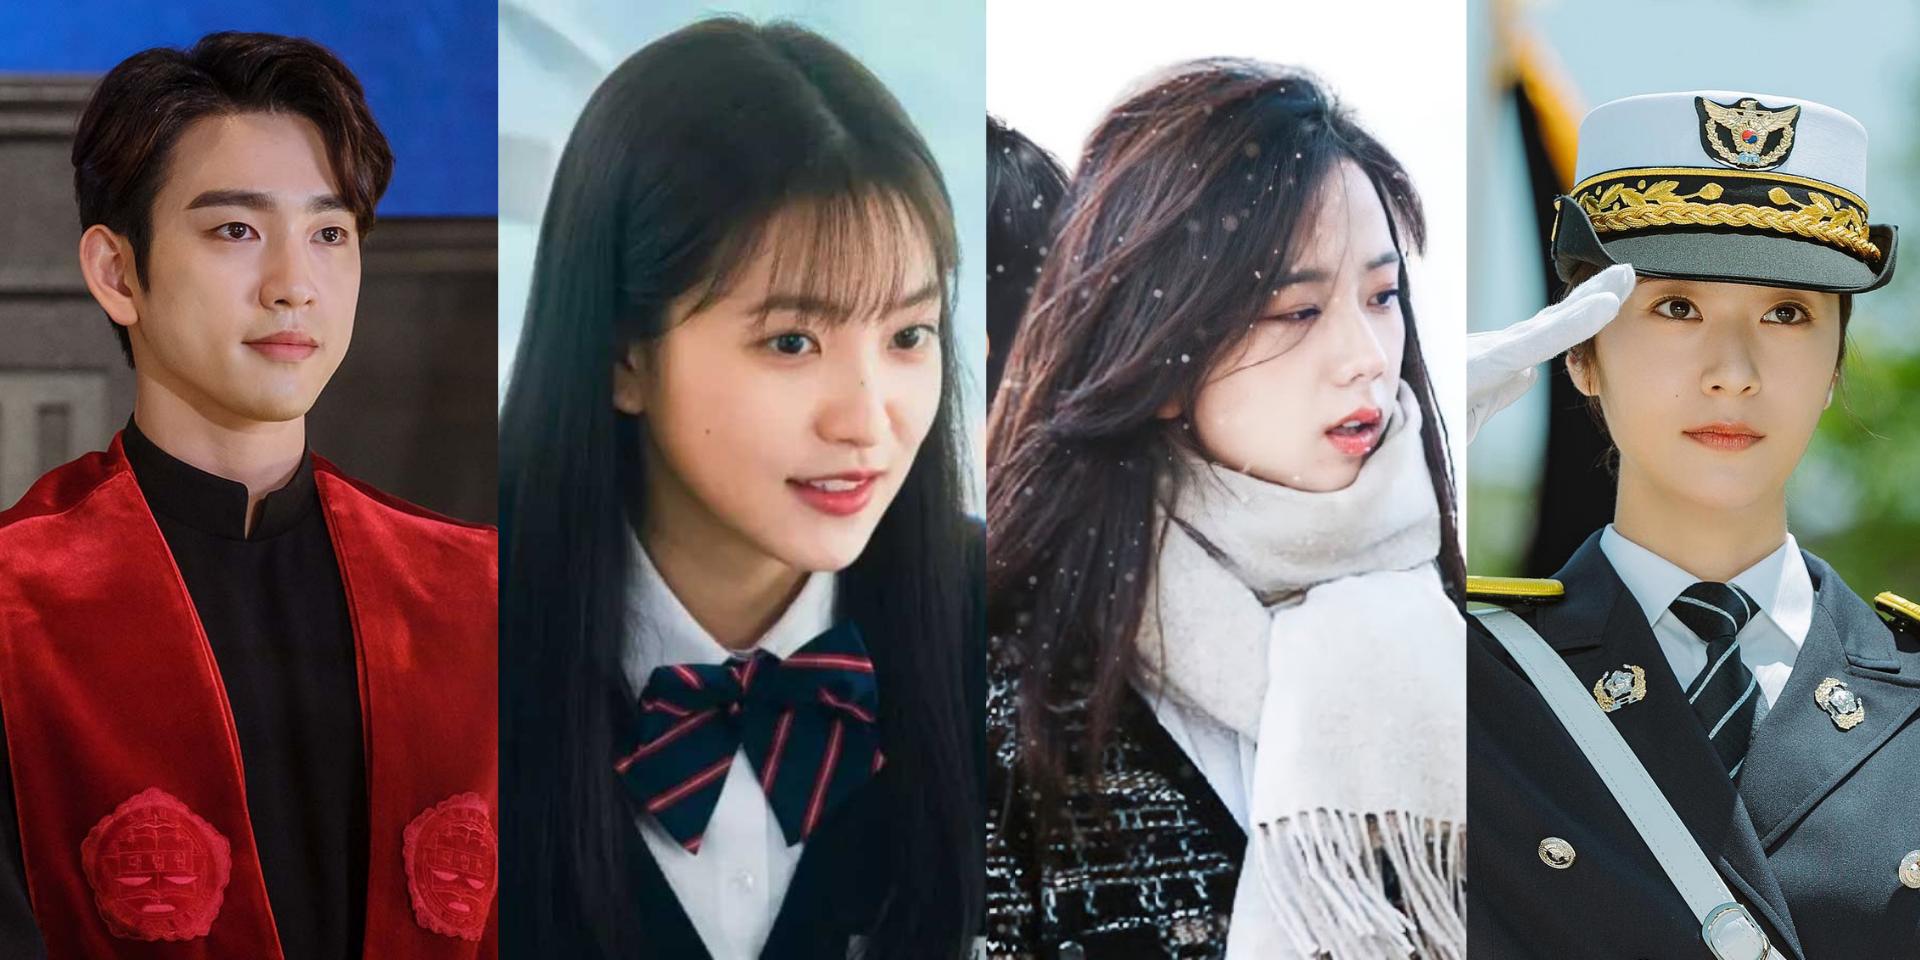 2021 K-dramas starring K-pop idols: The Devil Judge, Police University, Snowdrop, Blue Birthday, and more